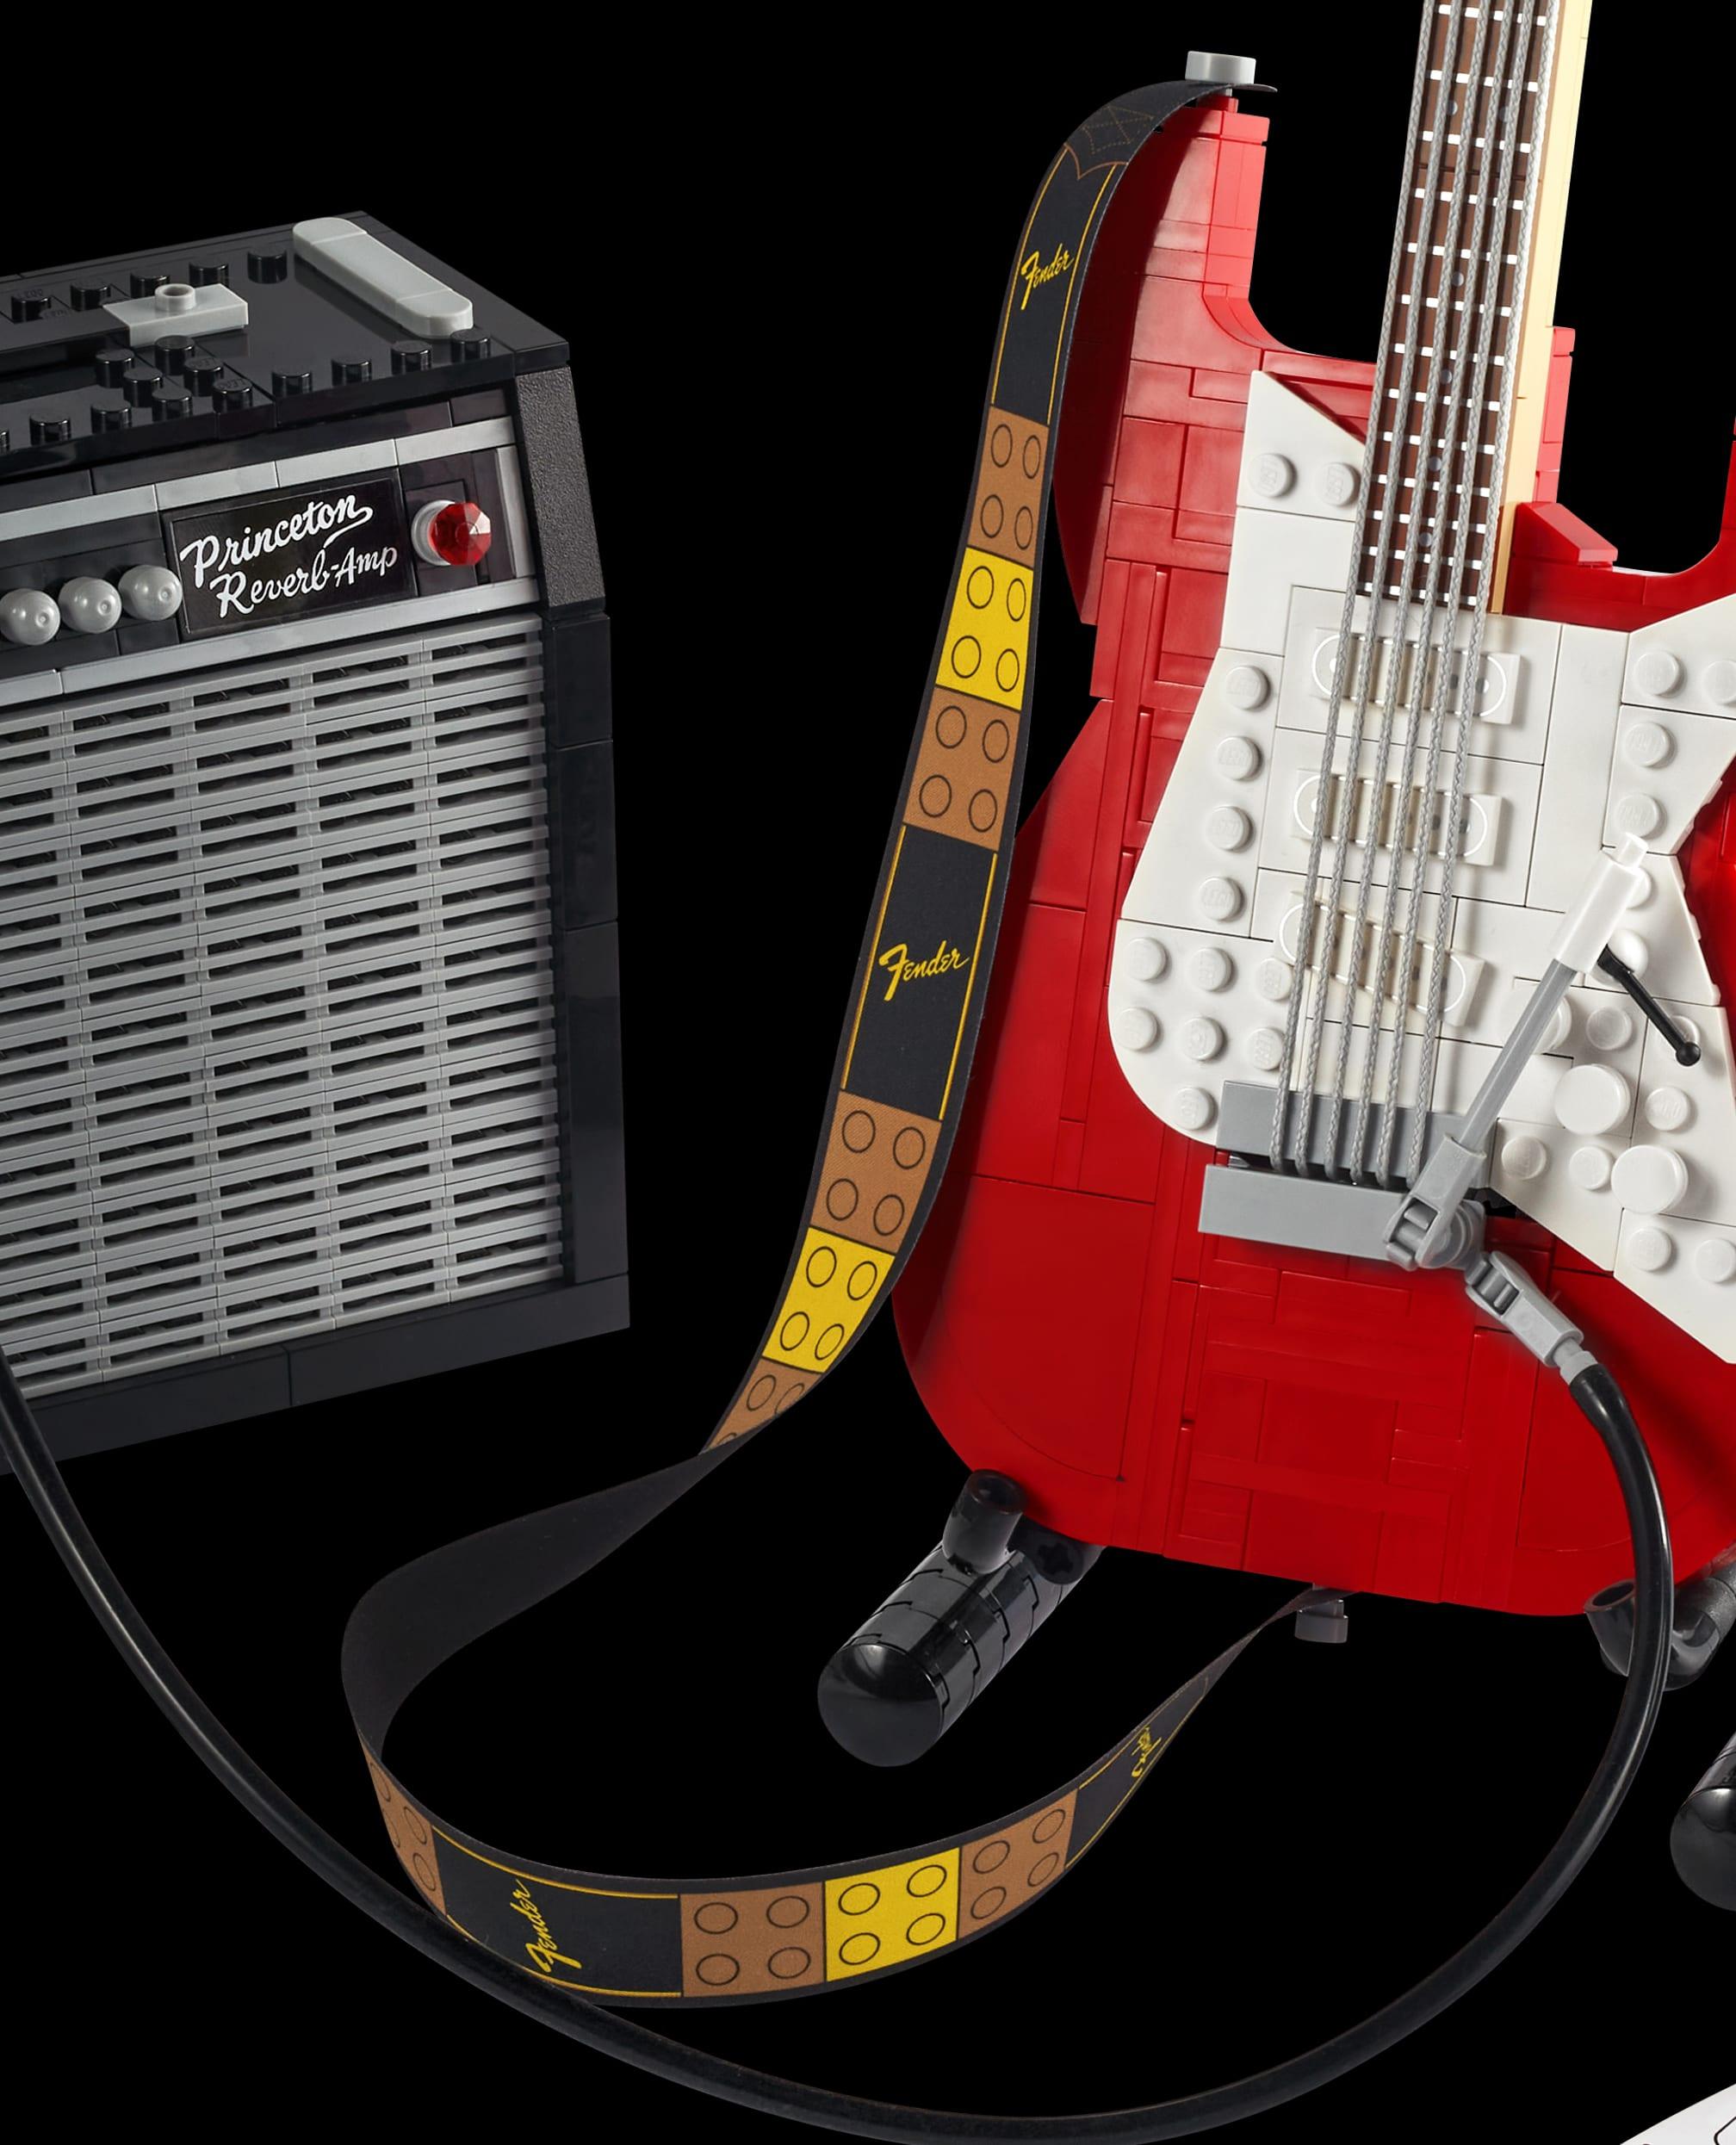 LEGO 21329 Fender Stratocaster Neue Teile06